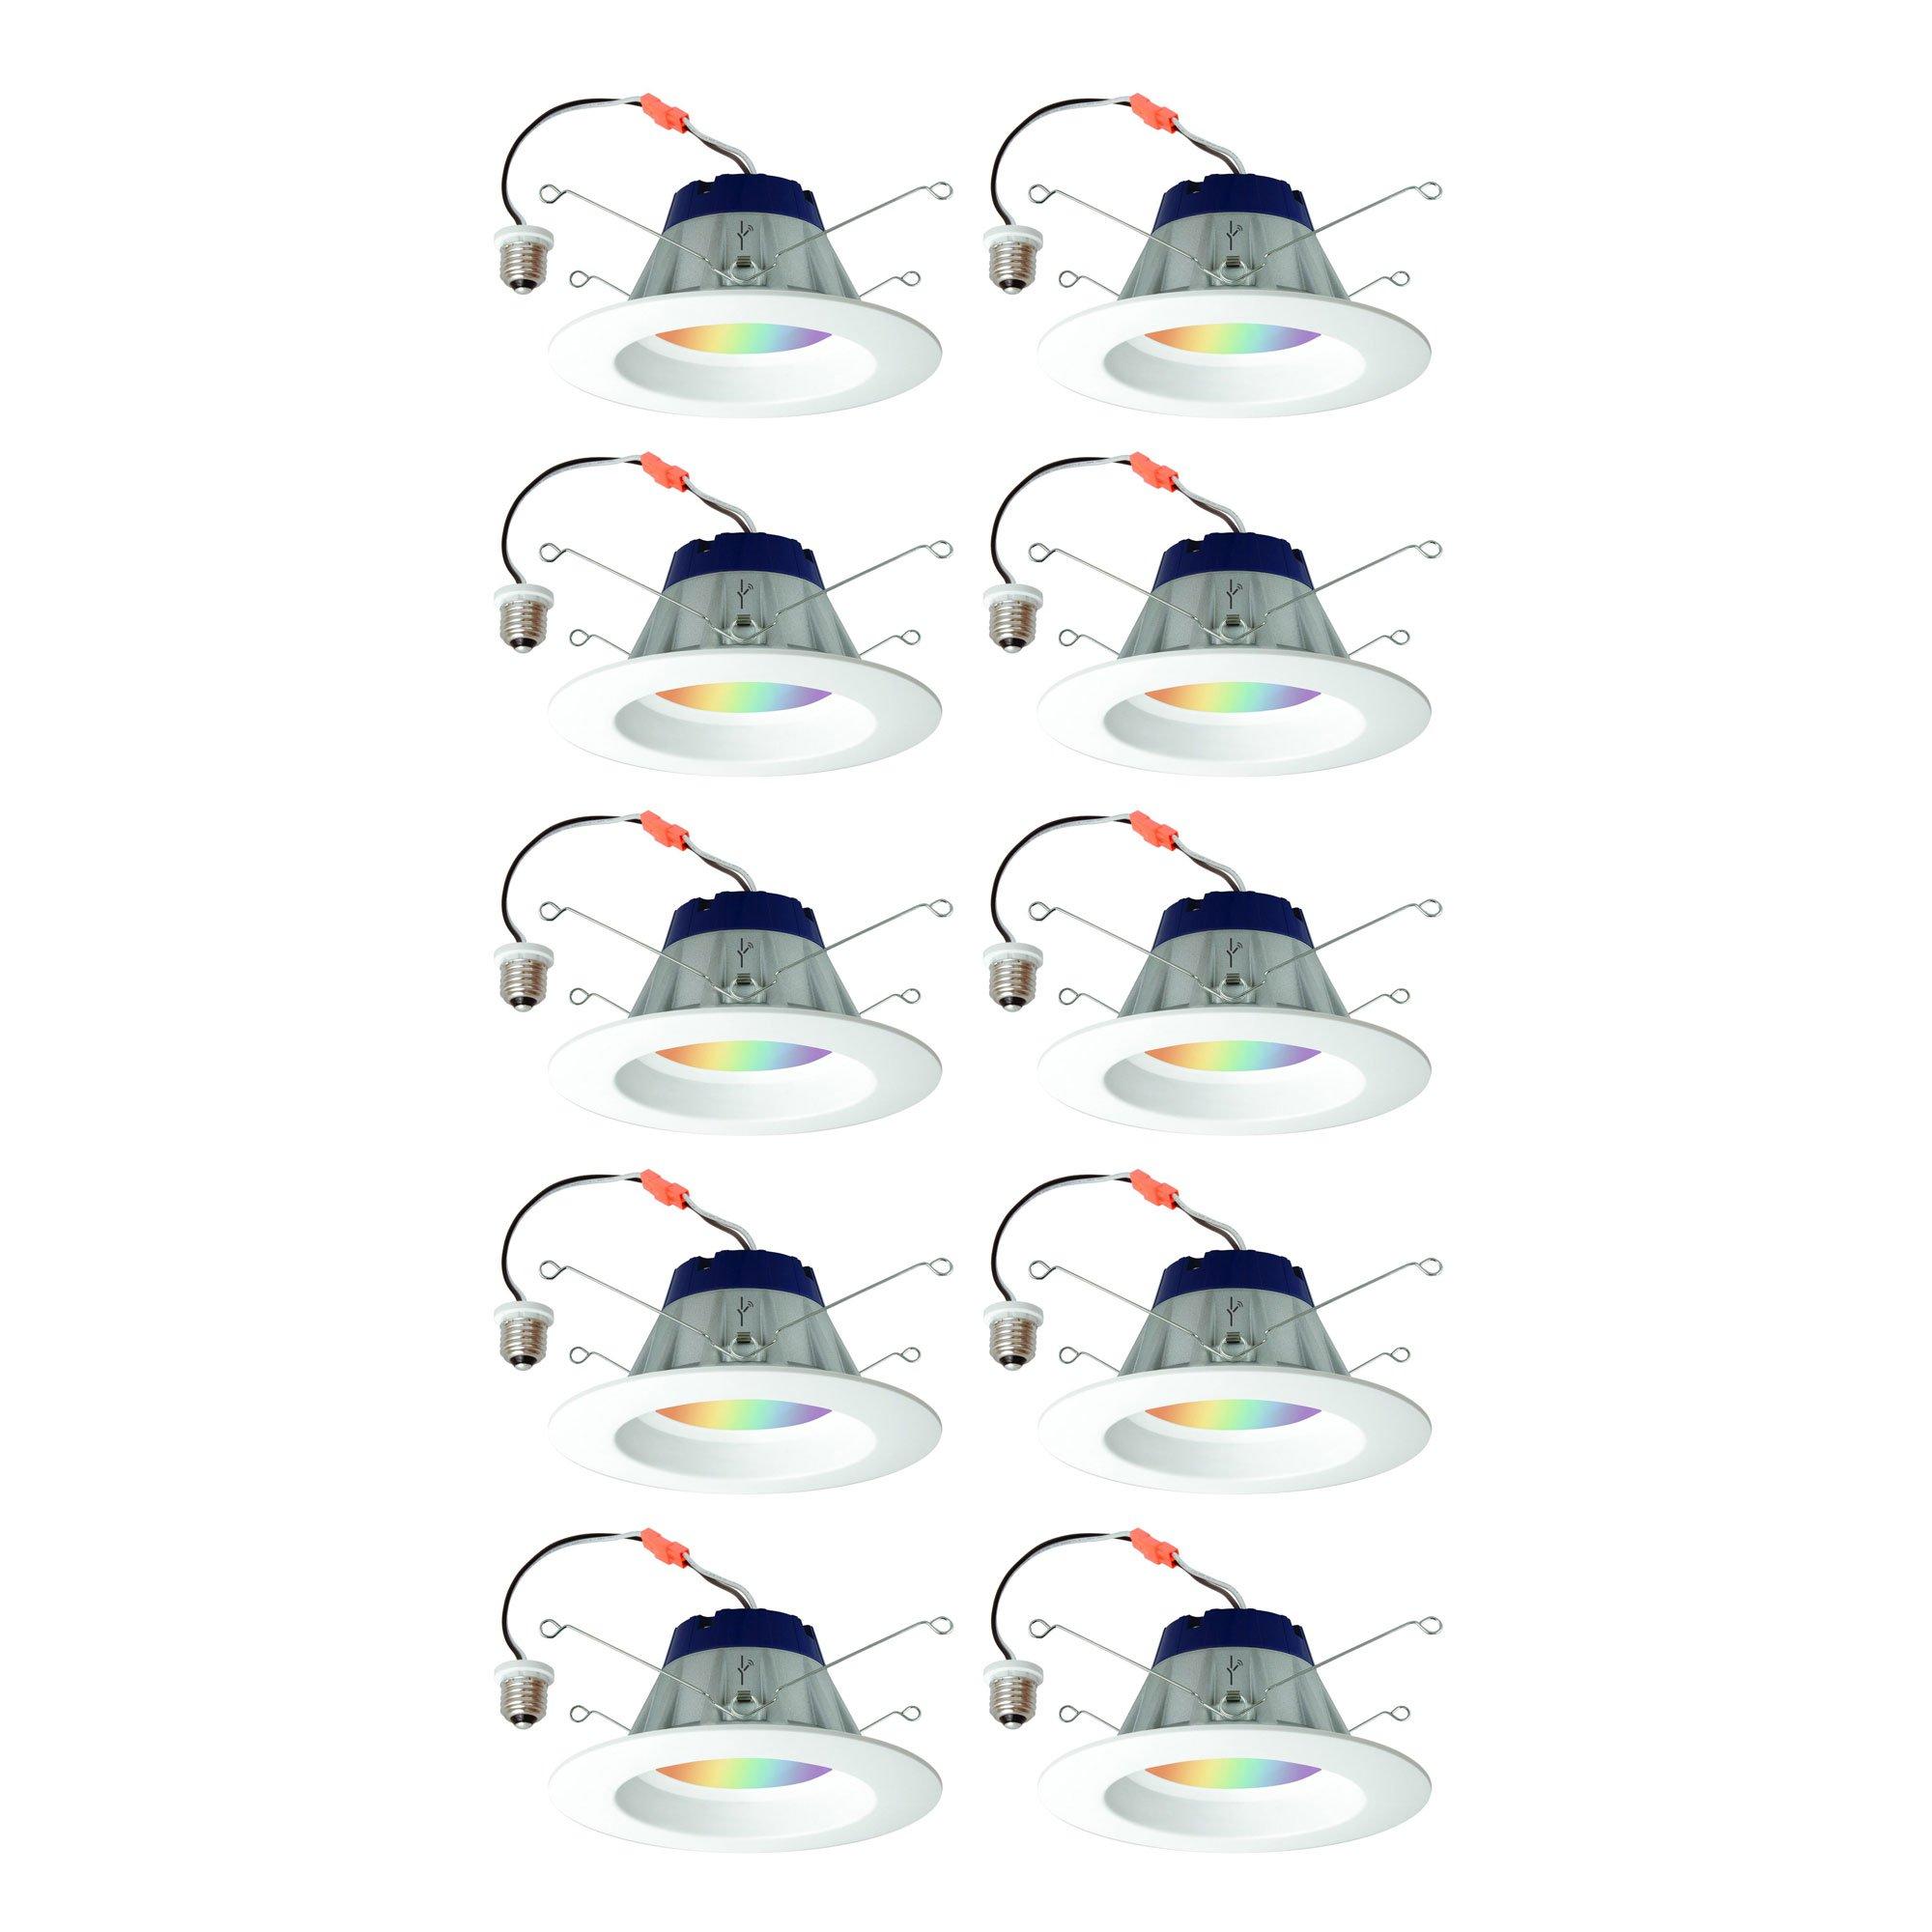 Sylvania Lightify 65W LED Smart Home 2700-6500K Color/White Light Bulb (10 Pack) - image 7 de 7